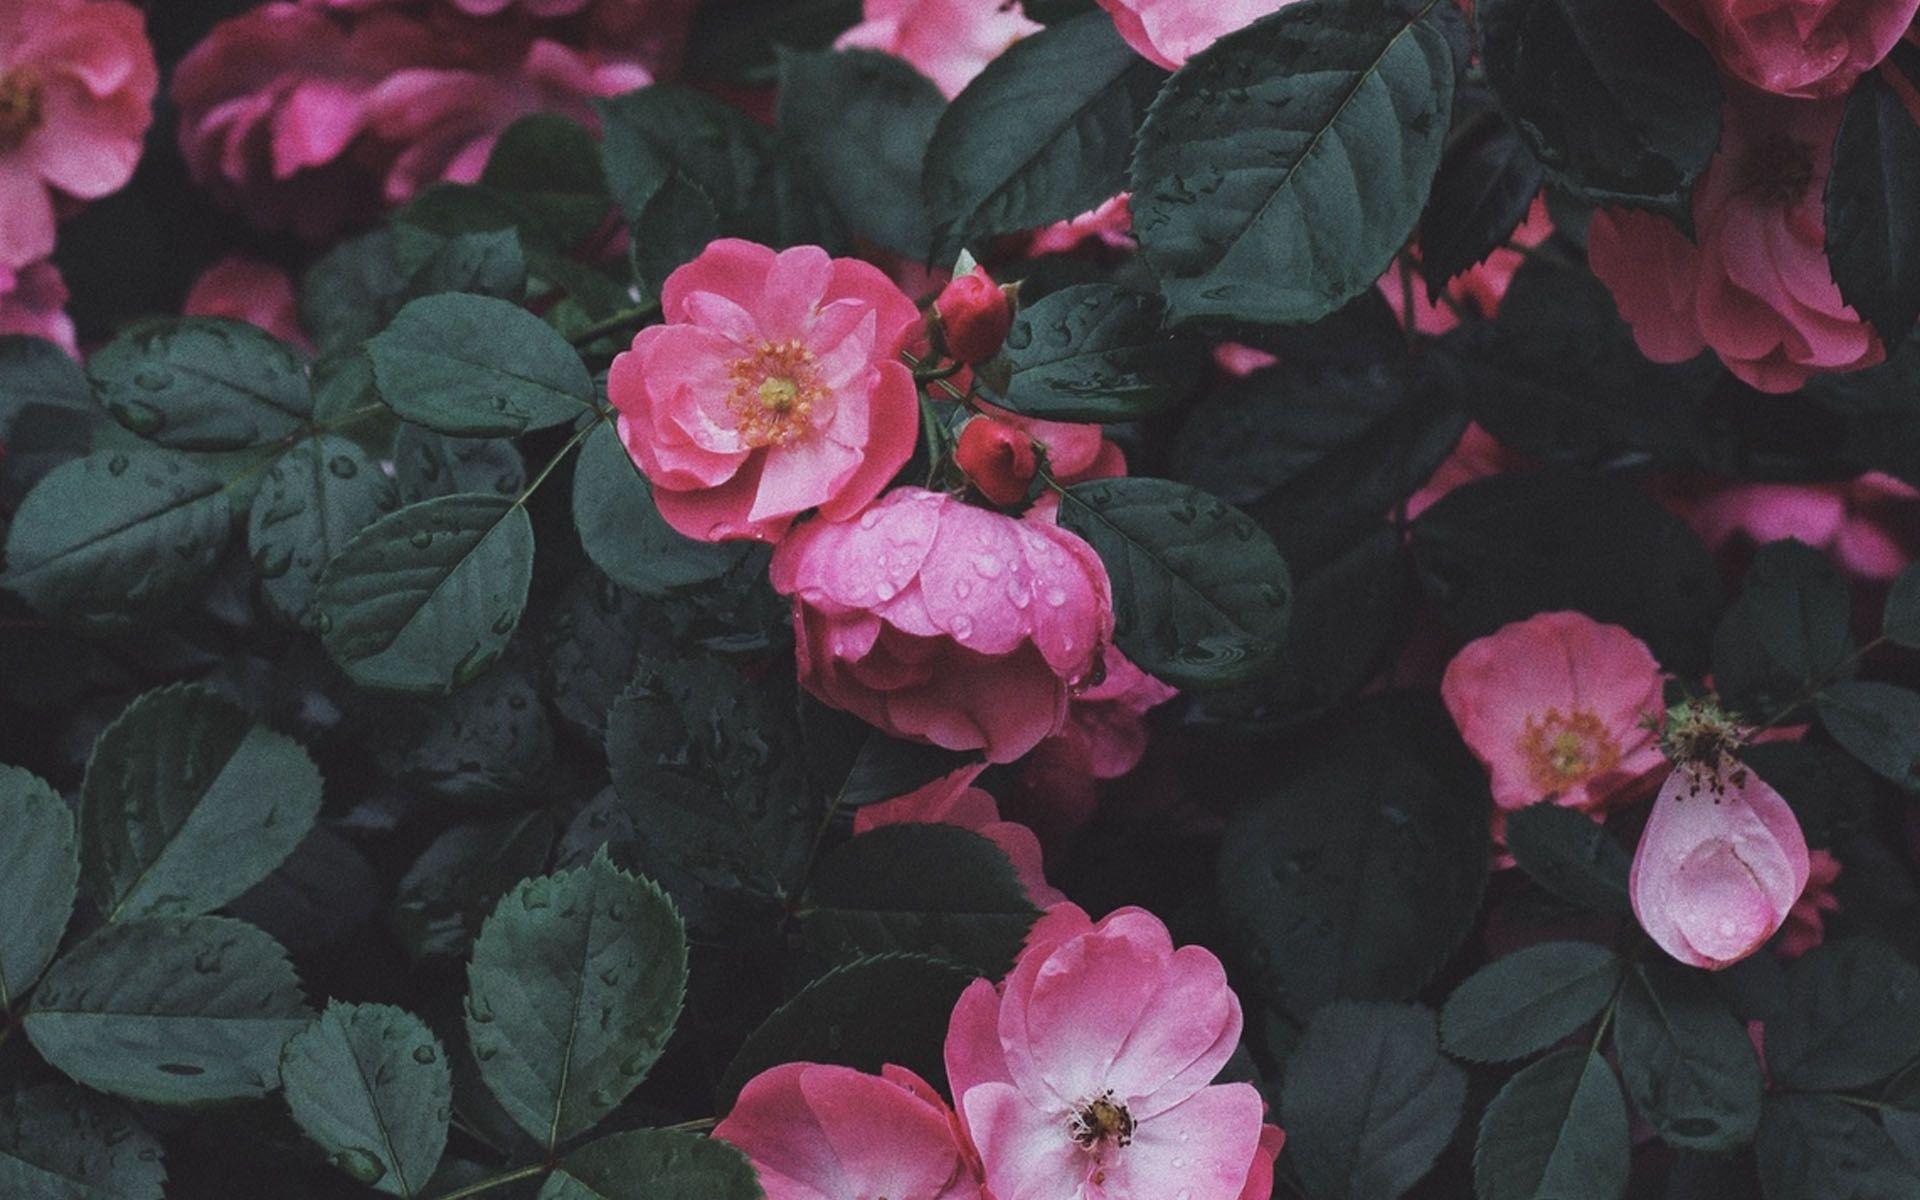 Wild Rose Hd Wallpaper Wild Roses Wallpaper Rose